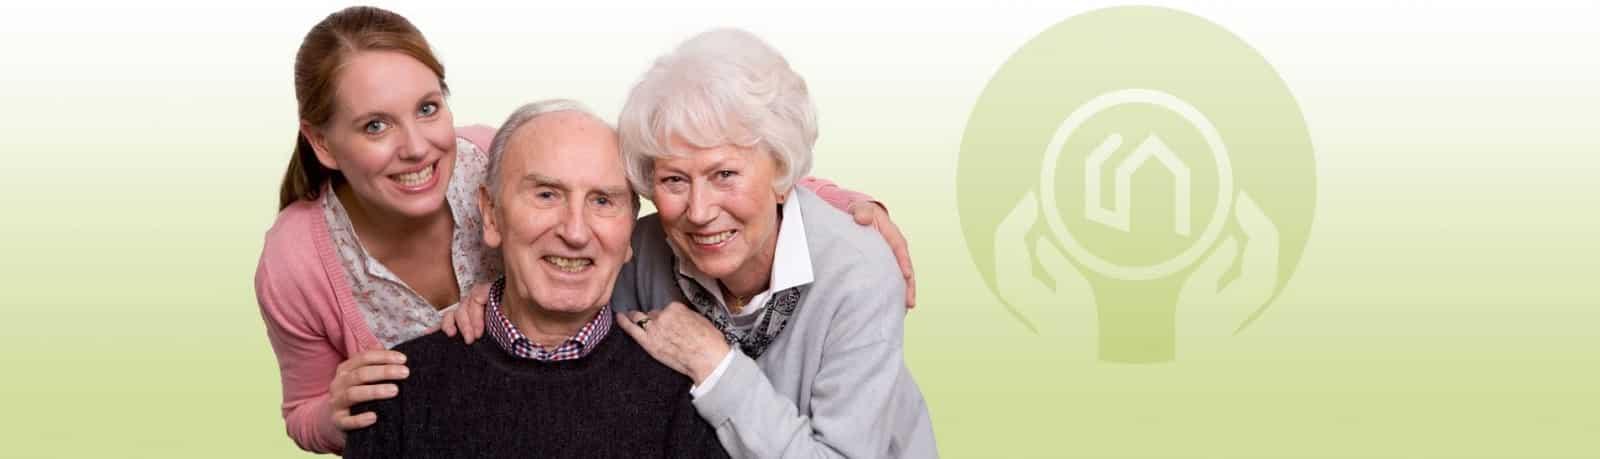 sencurina seniorenbetreuung - Sencurina - betreut wohnen zuhause